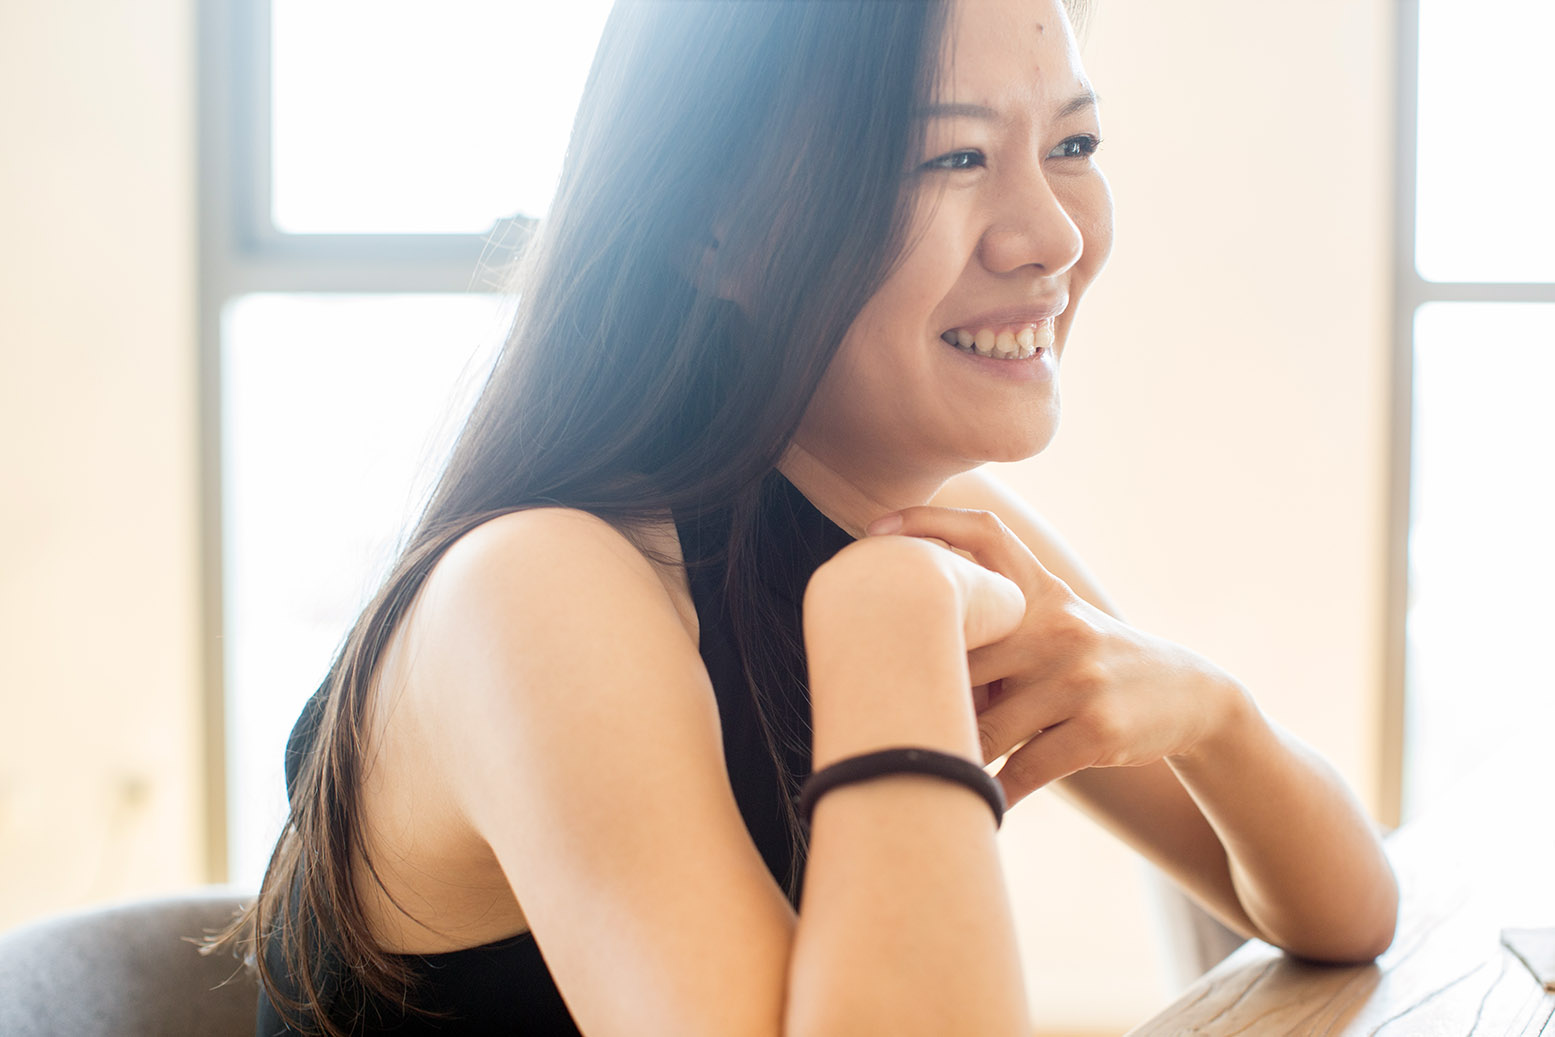 Susan Kuang是自由撰稿人也是第2身份和壹陸學園的創始人。